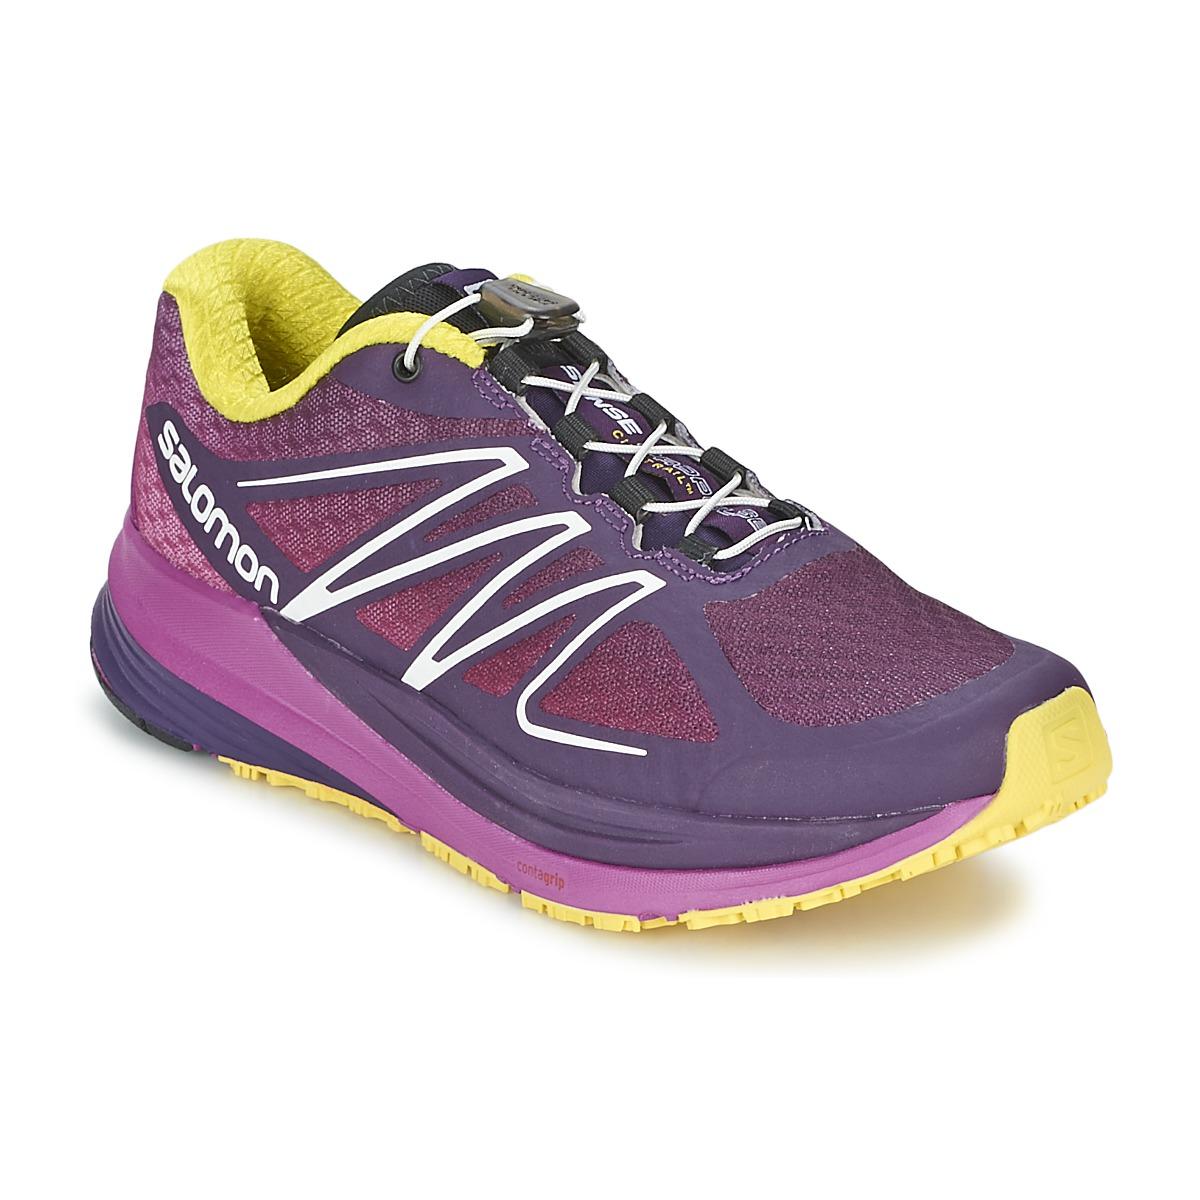 Chaussures-de-running Salomon SENSE PROPULSE W Violet / Rose / Jaune